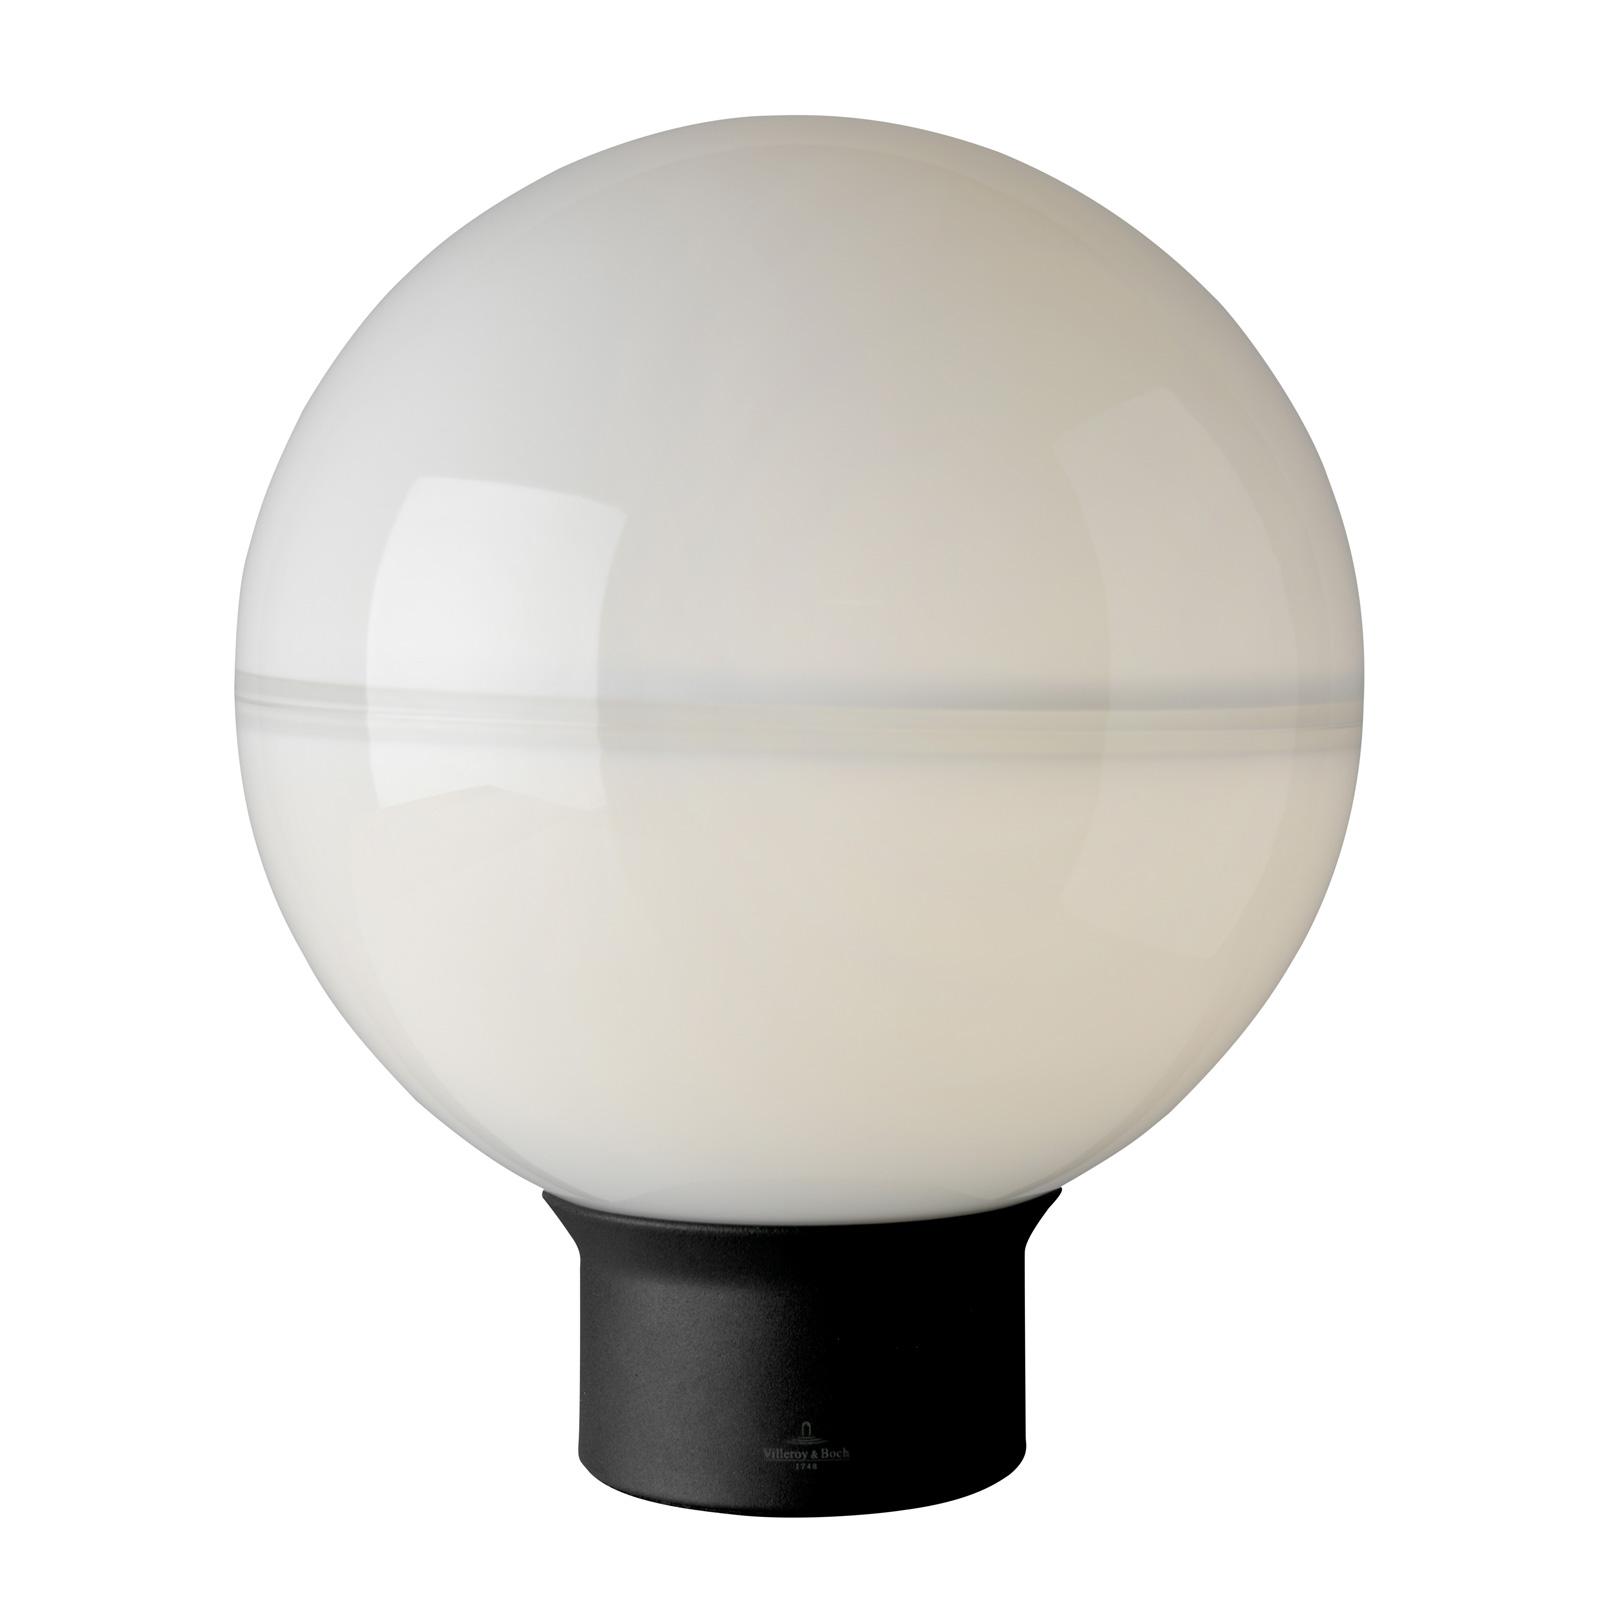 Villeroy & Boch Tokio tafellamp zwart-wit 30cm